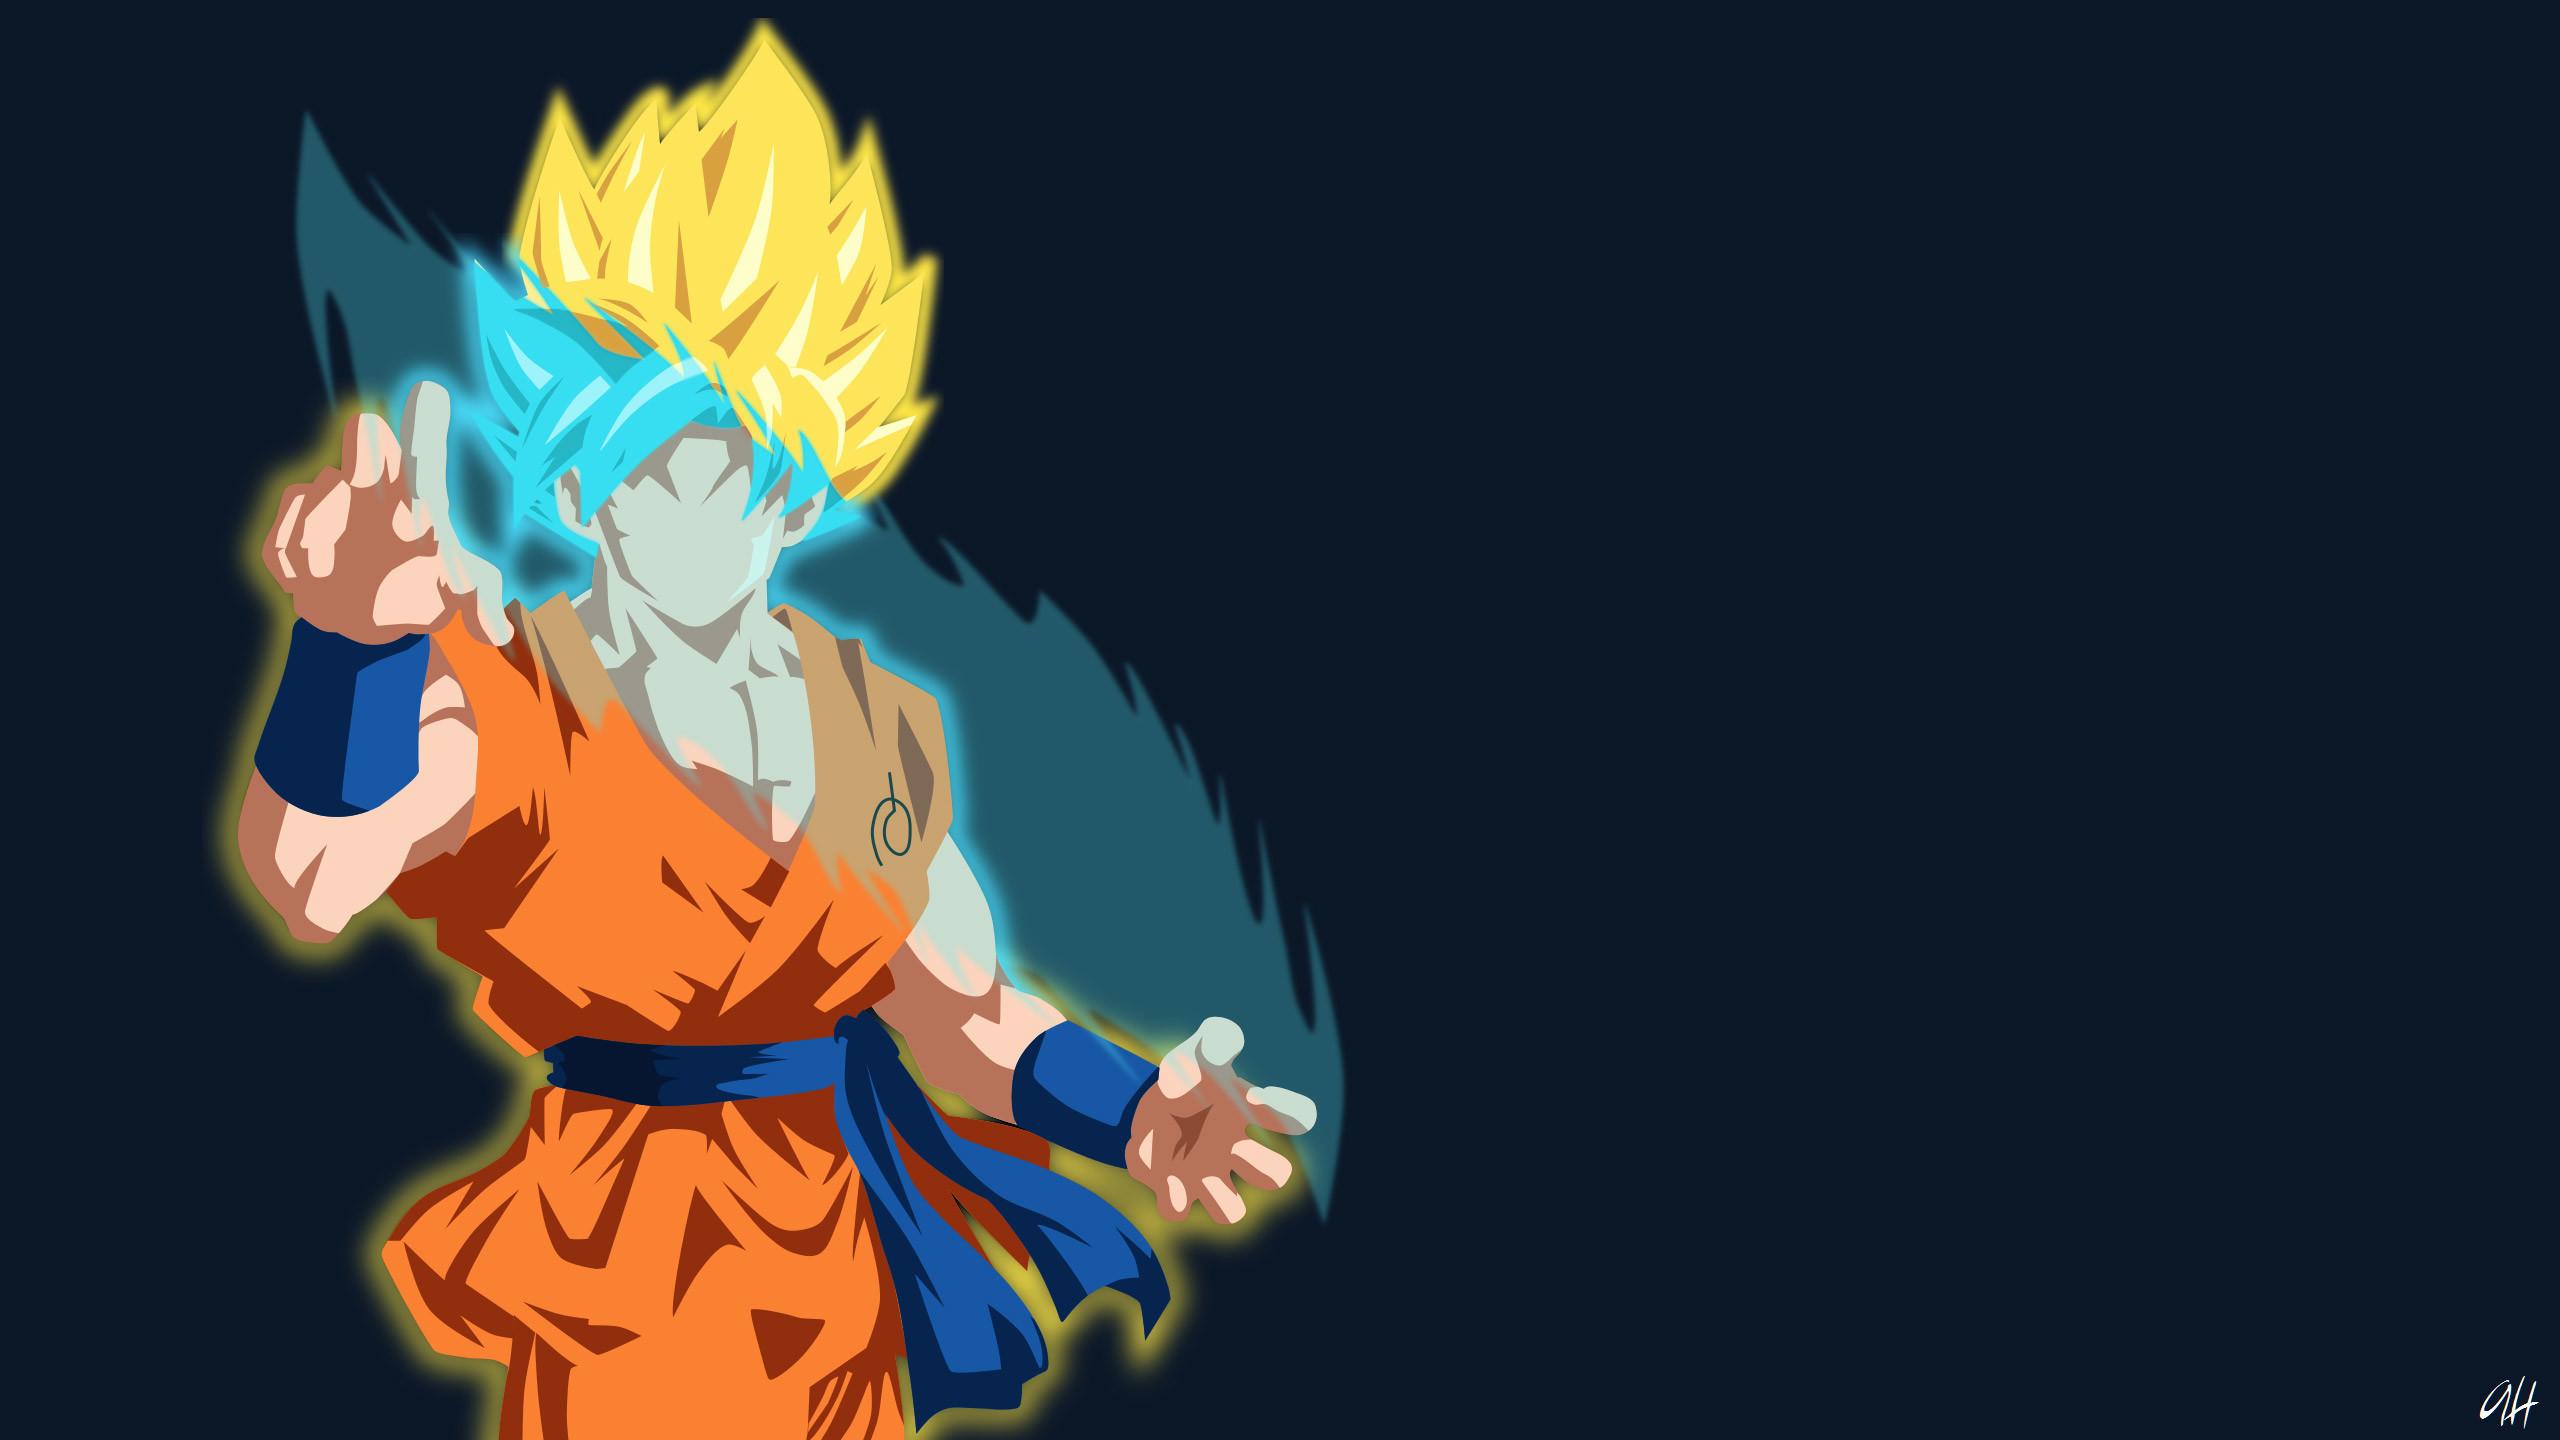 Goku Minimalist